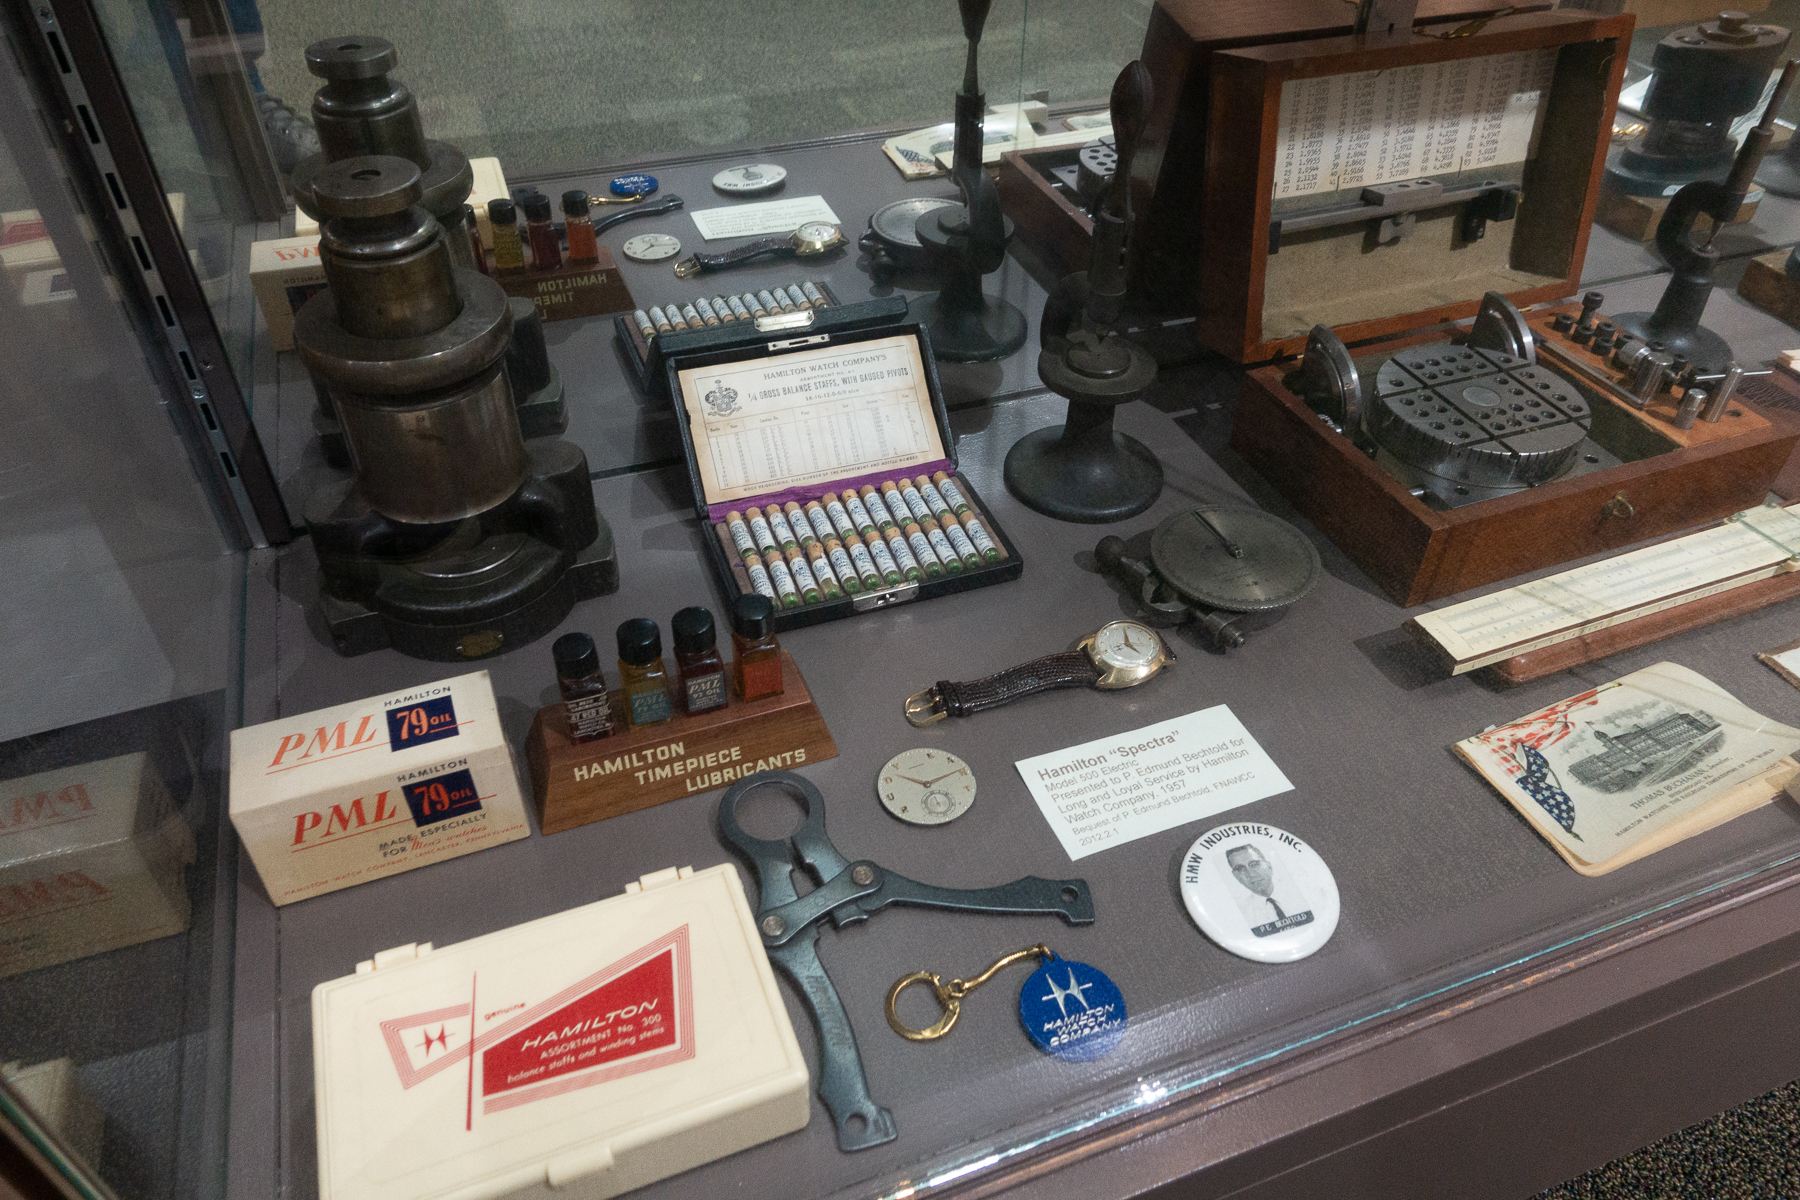 Tools & Promo Items